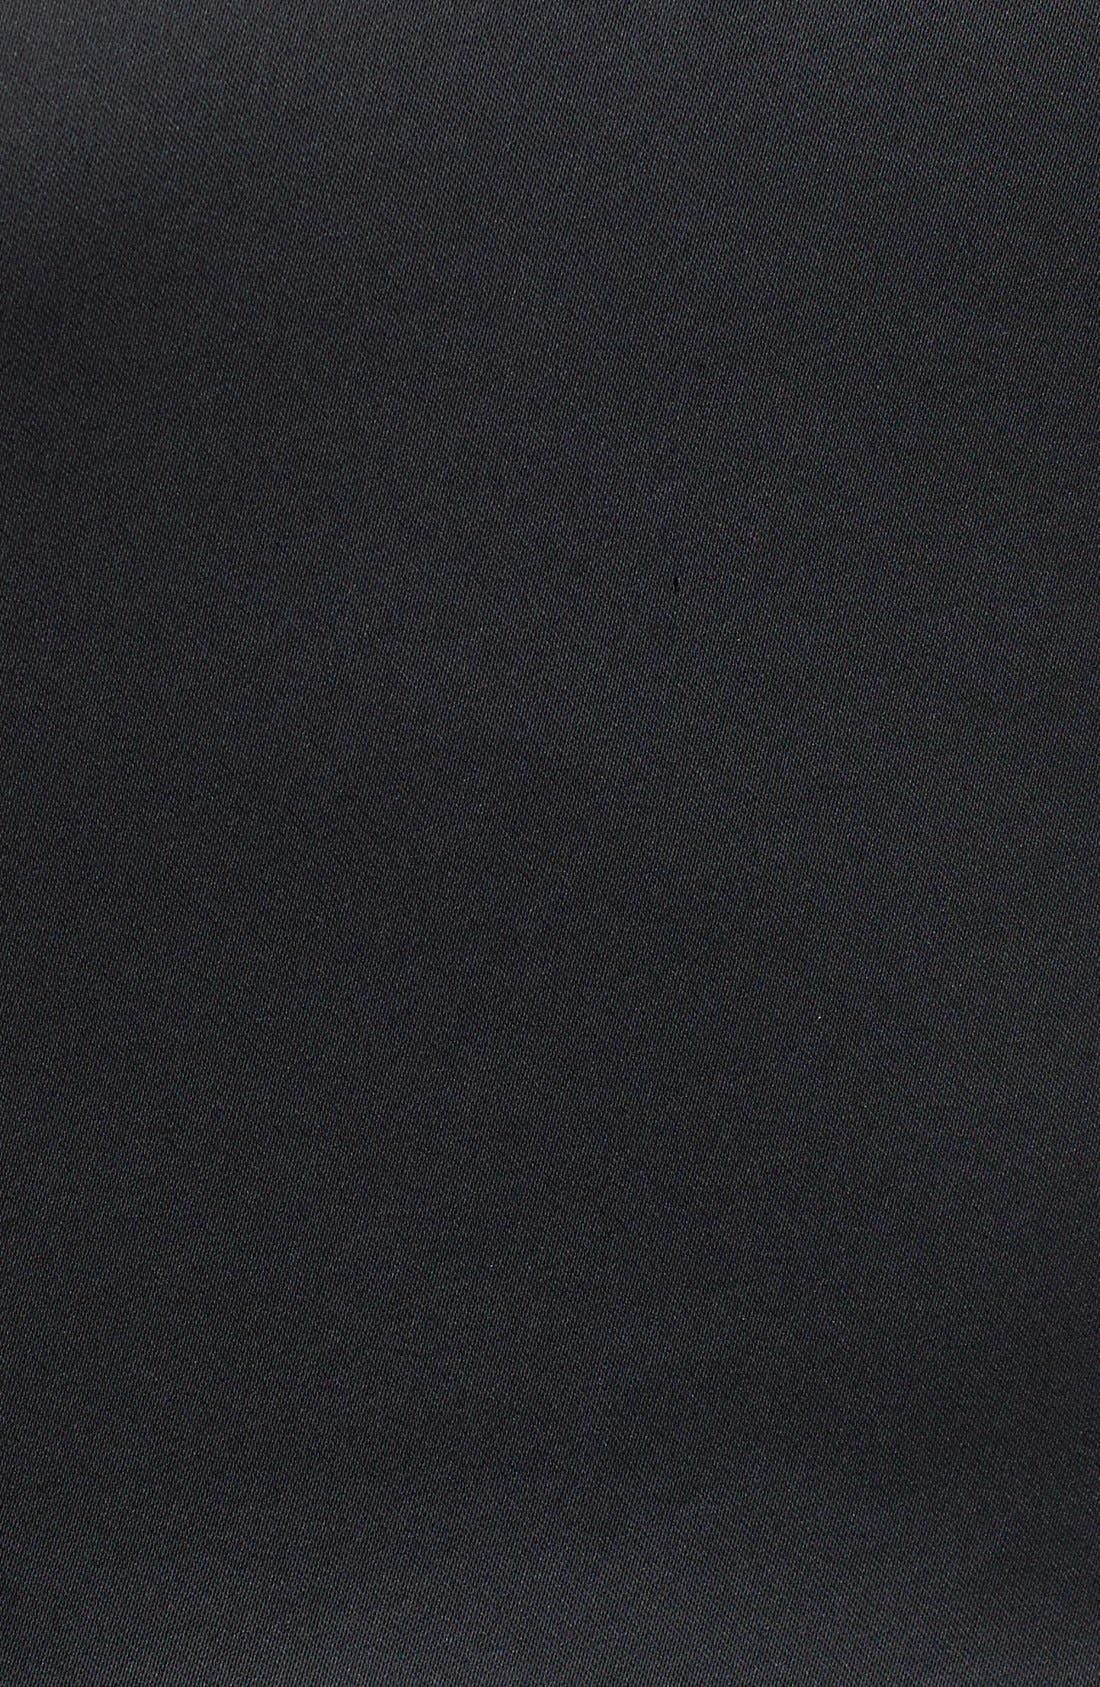 Alternate Image 3  - ERIN erin fetherston 'Winona' Stretch Satin Dress